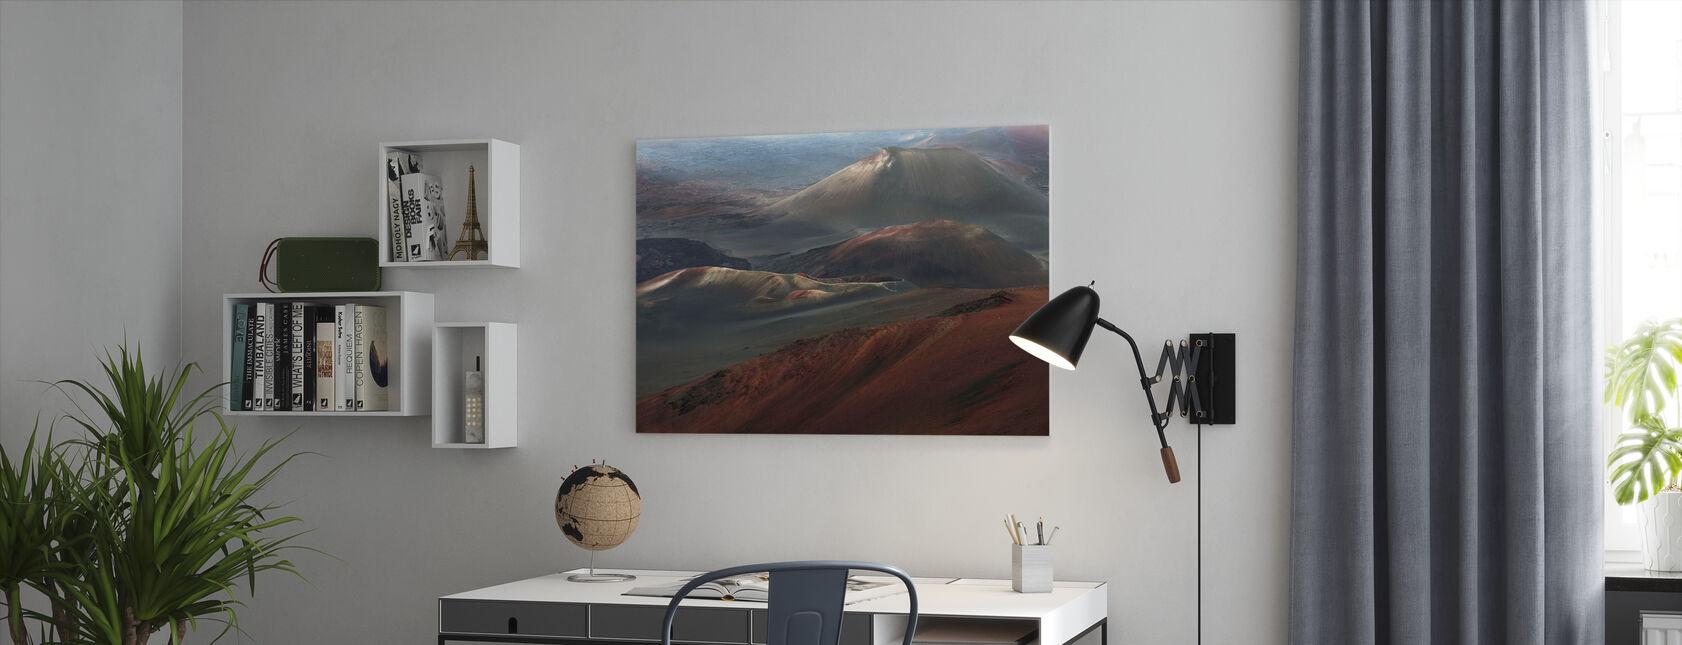 Hawaii - Canvas print - Office